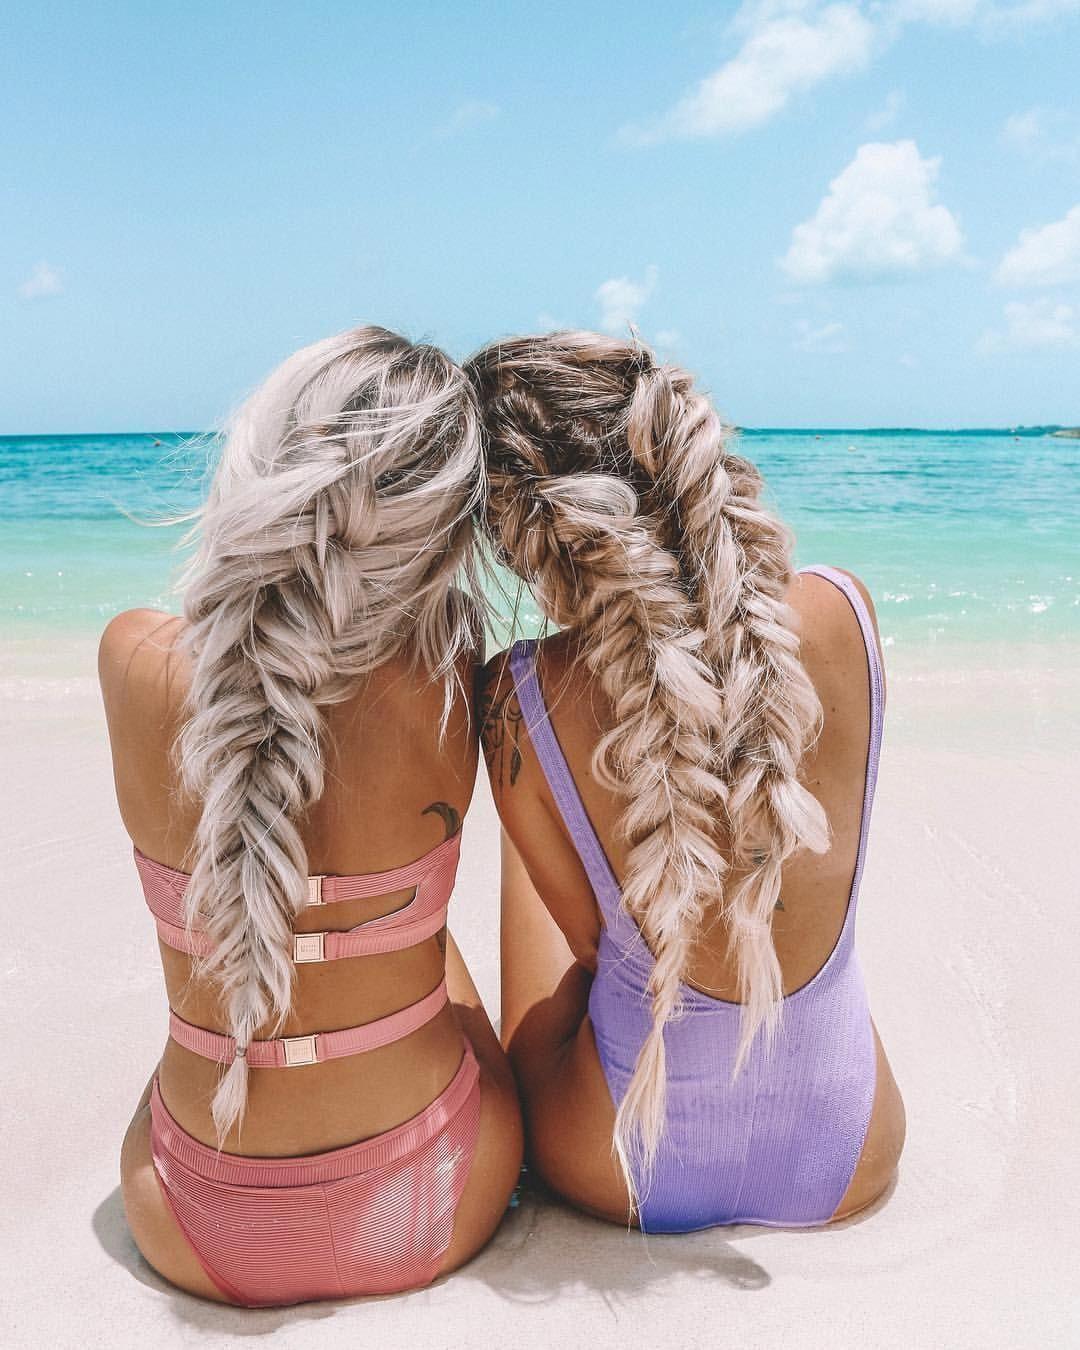 Hair Inspiration 2019-04-14 23:12:05